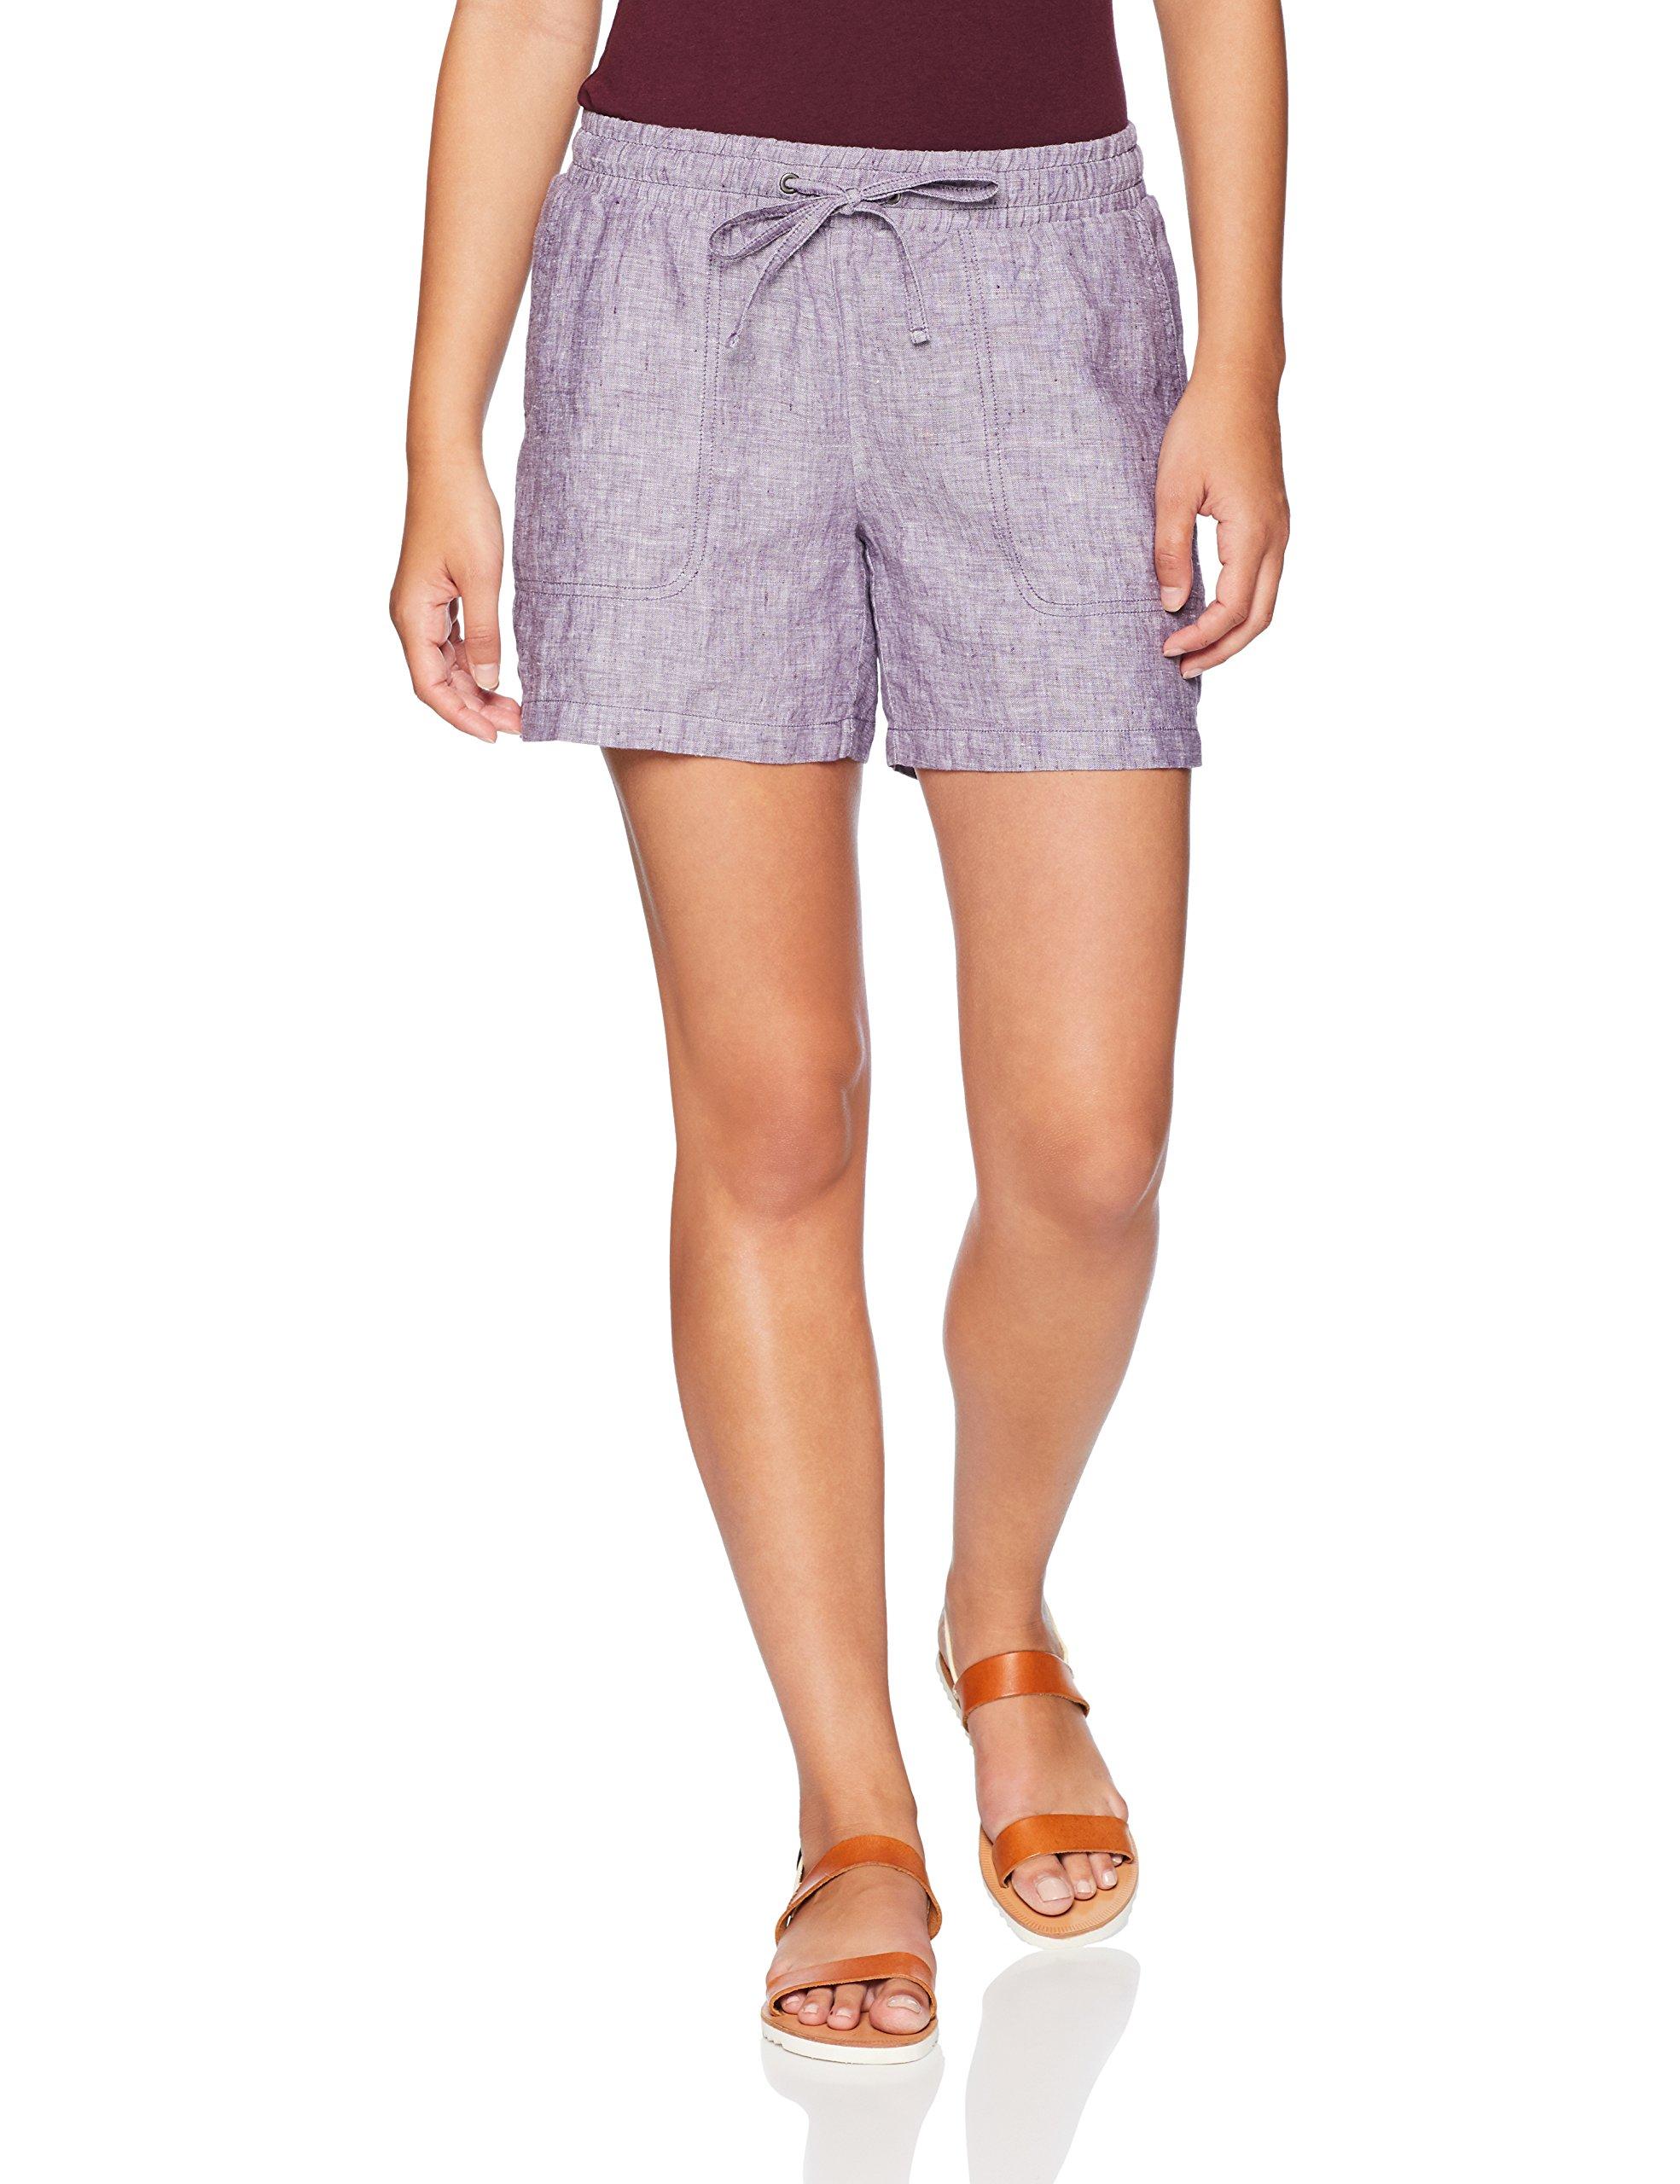 Amazon Essentials Women's 5'' Drawstring Solid Linen Short, Purple, XX-Large